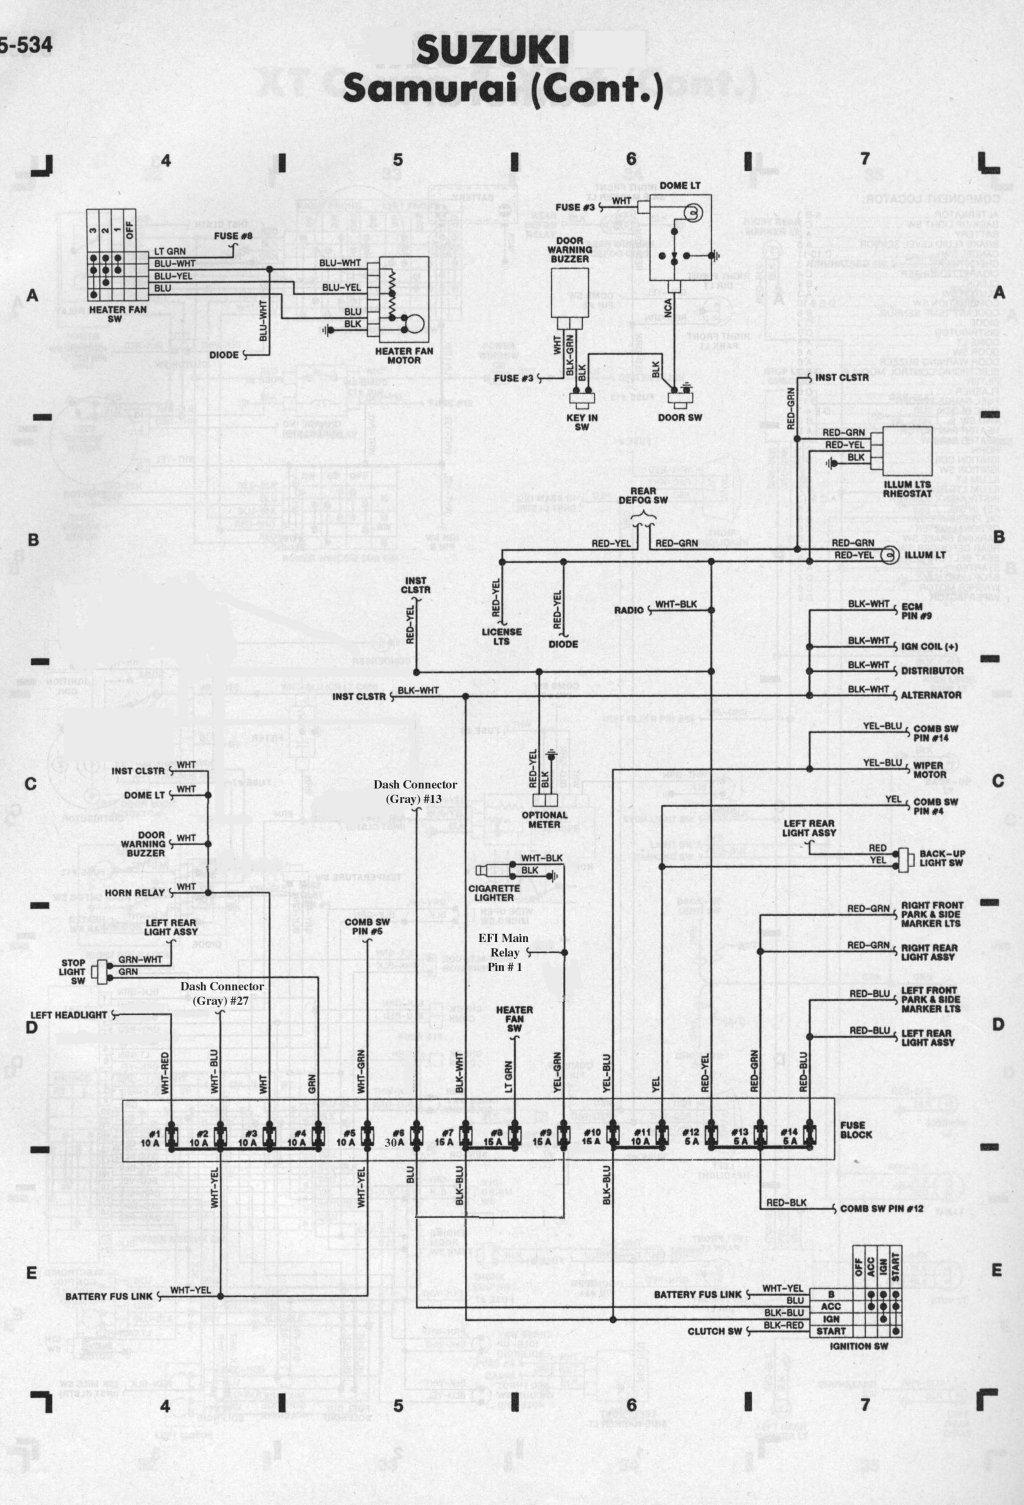 Schema Impianto Elettrico Suzuki Jimny : Schema impianto elettrico sj fare di una mosca